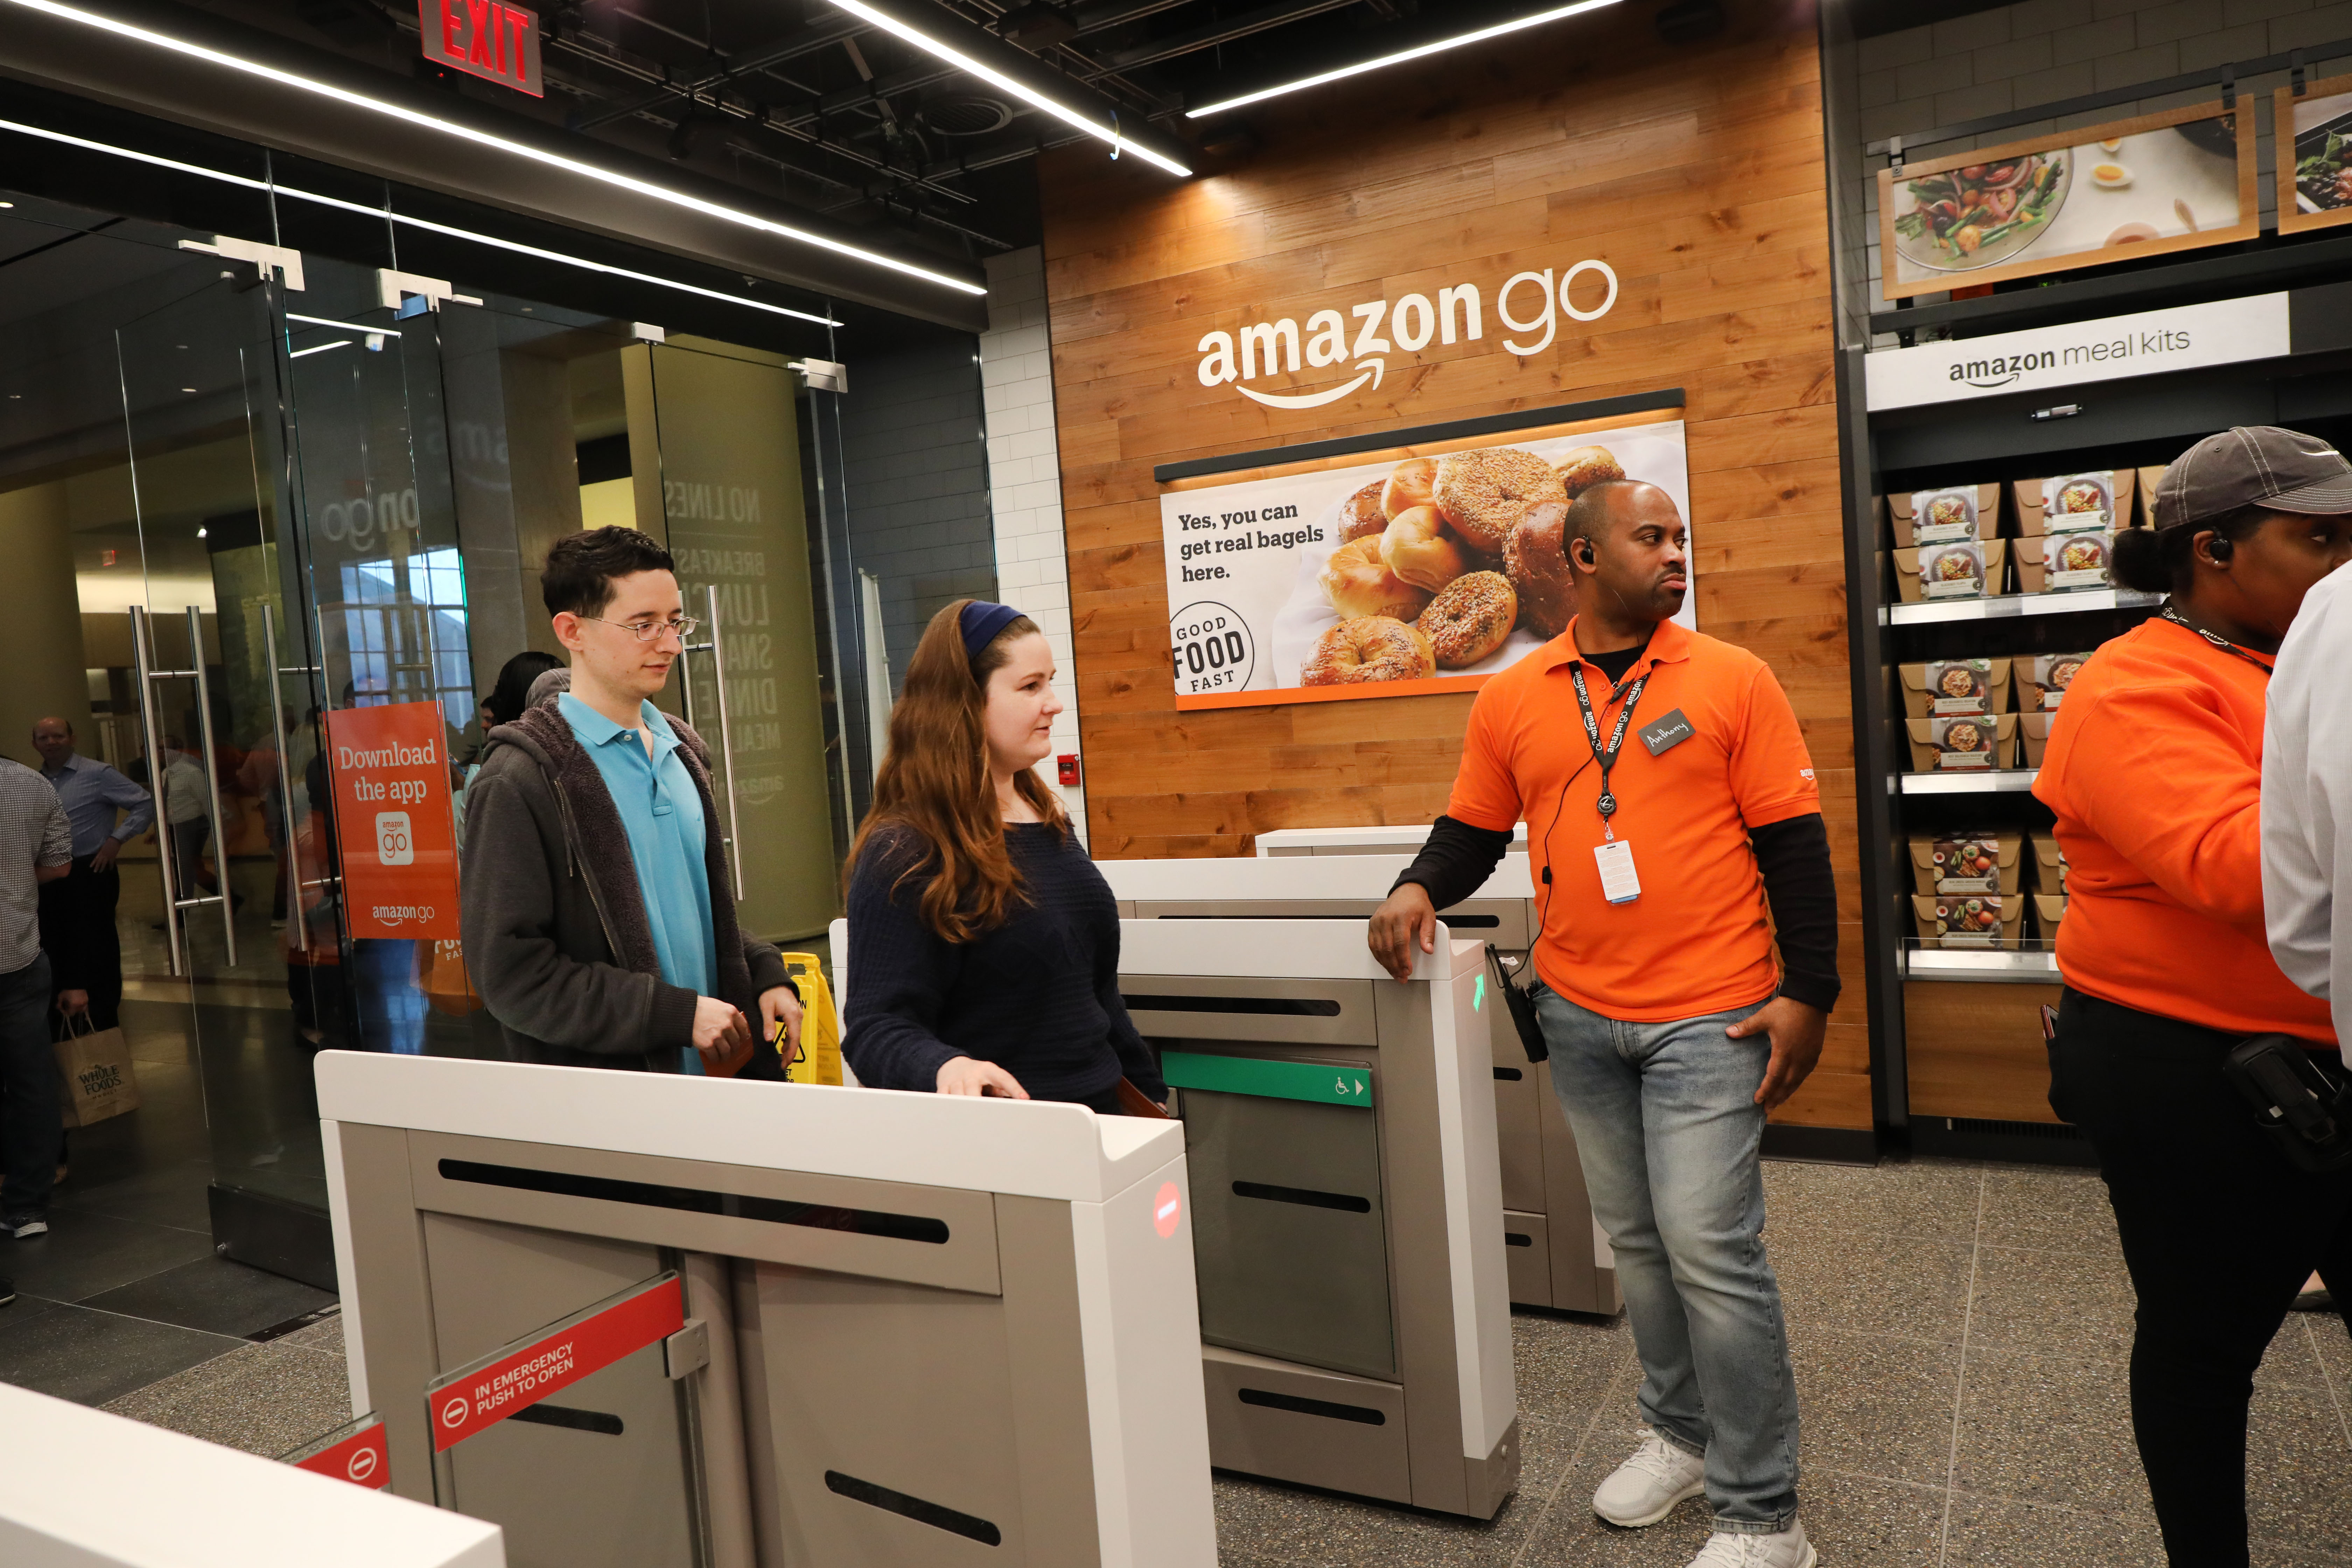 Customers walk through an Amazon Go store's entry gates.